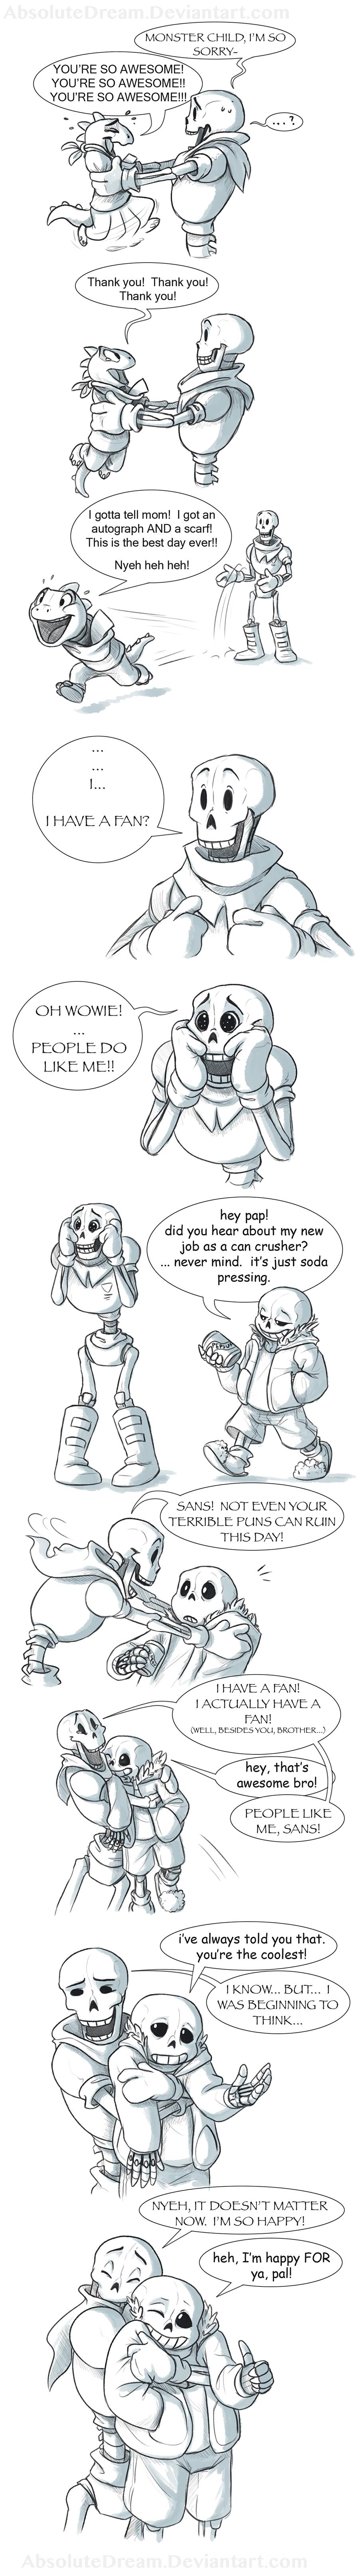 Papyrus's New Fan:  Part 3 of 3